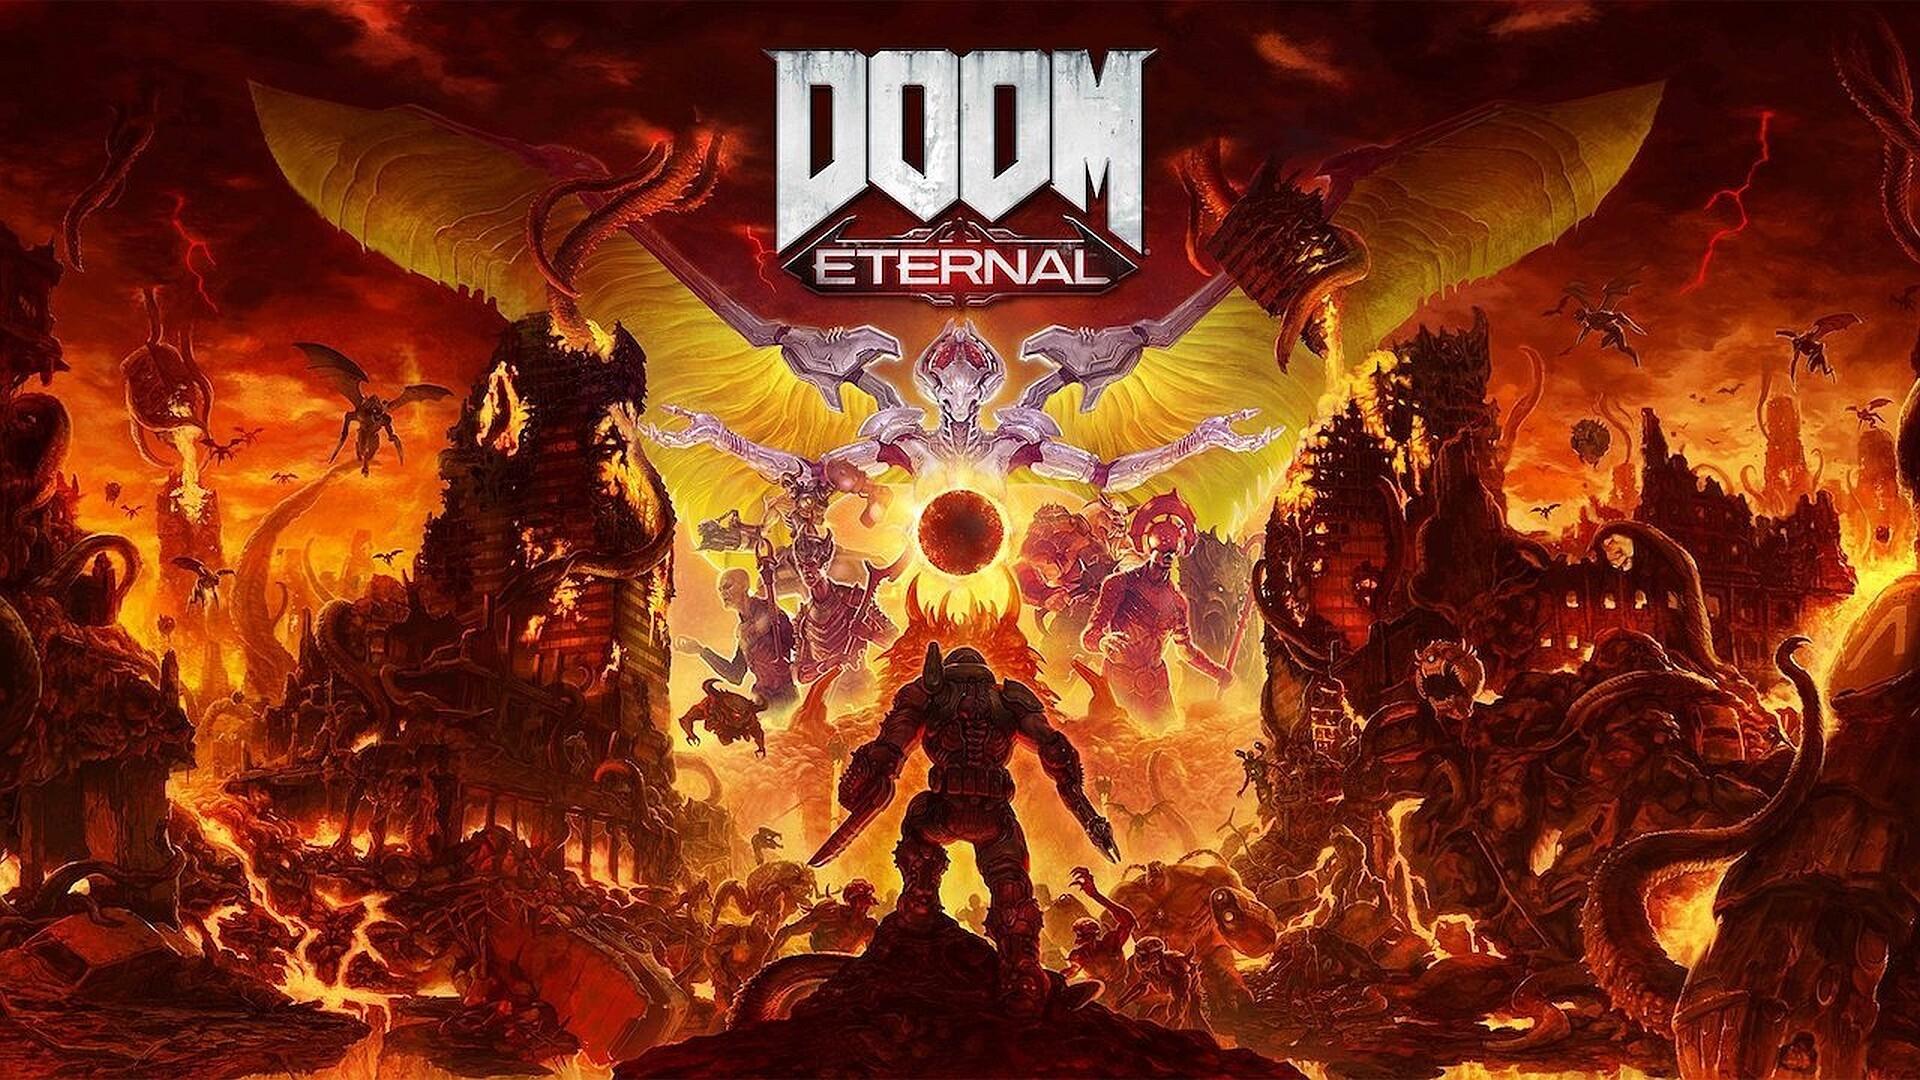 doom-eternal-soundtrack-ost Steam Awards